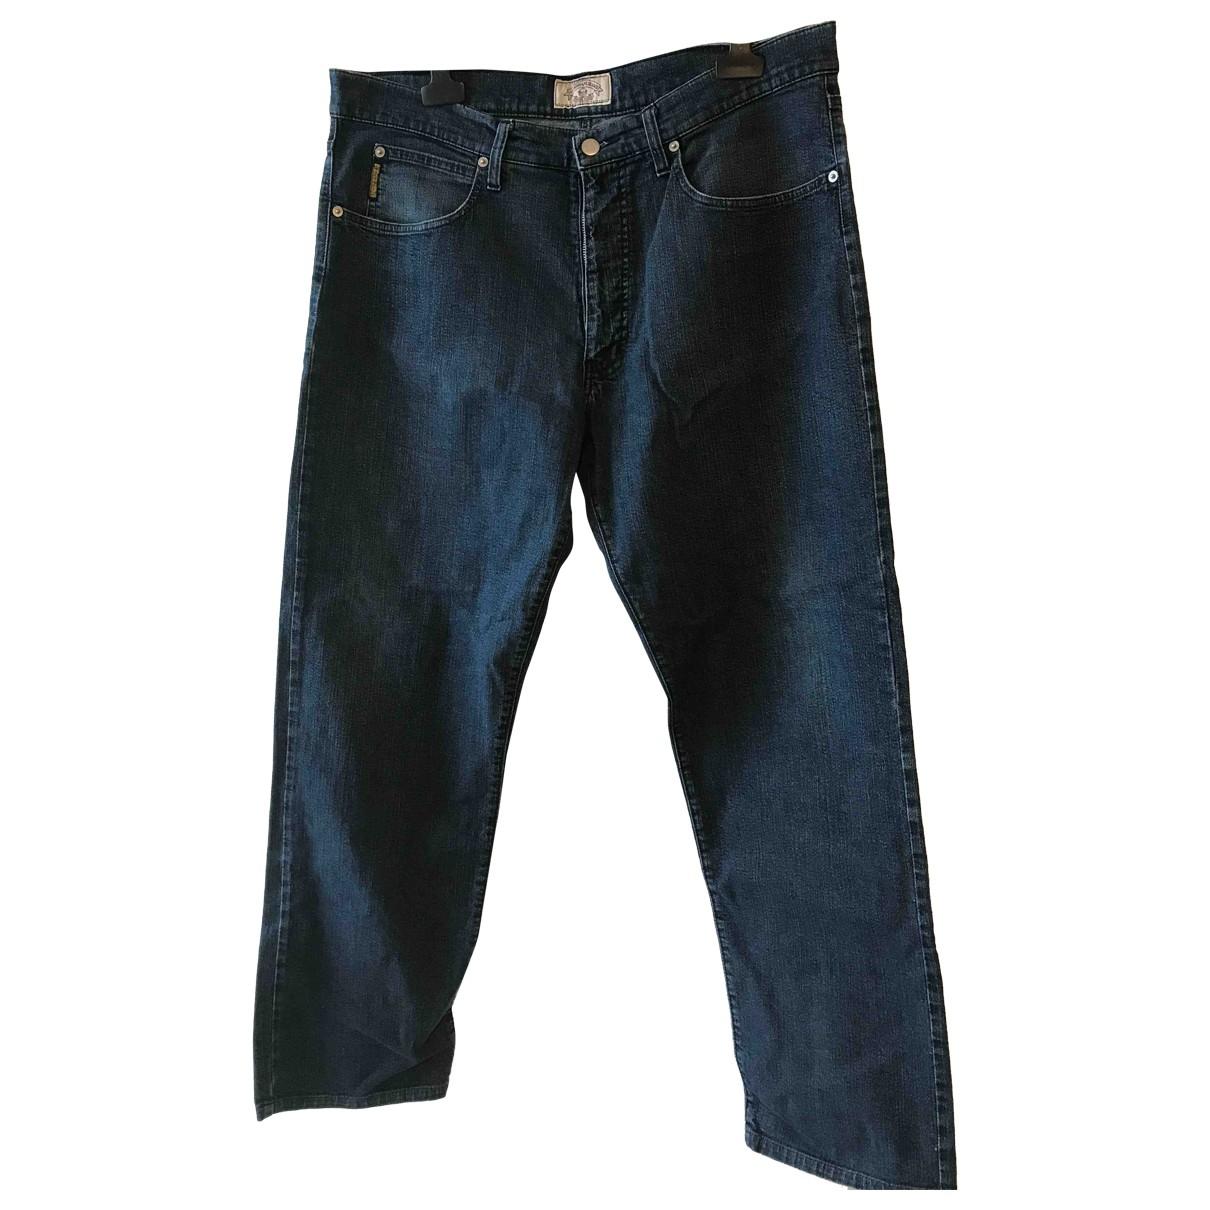 Armani Jeans \N Blue Cotton - elasthane Jeans for Men 38 FR